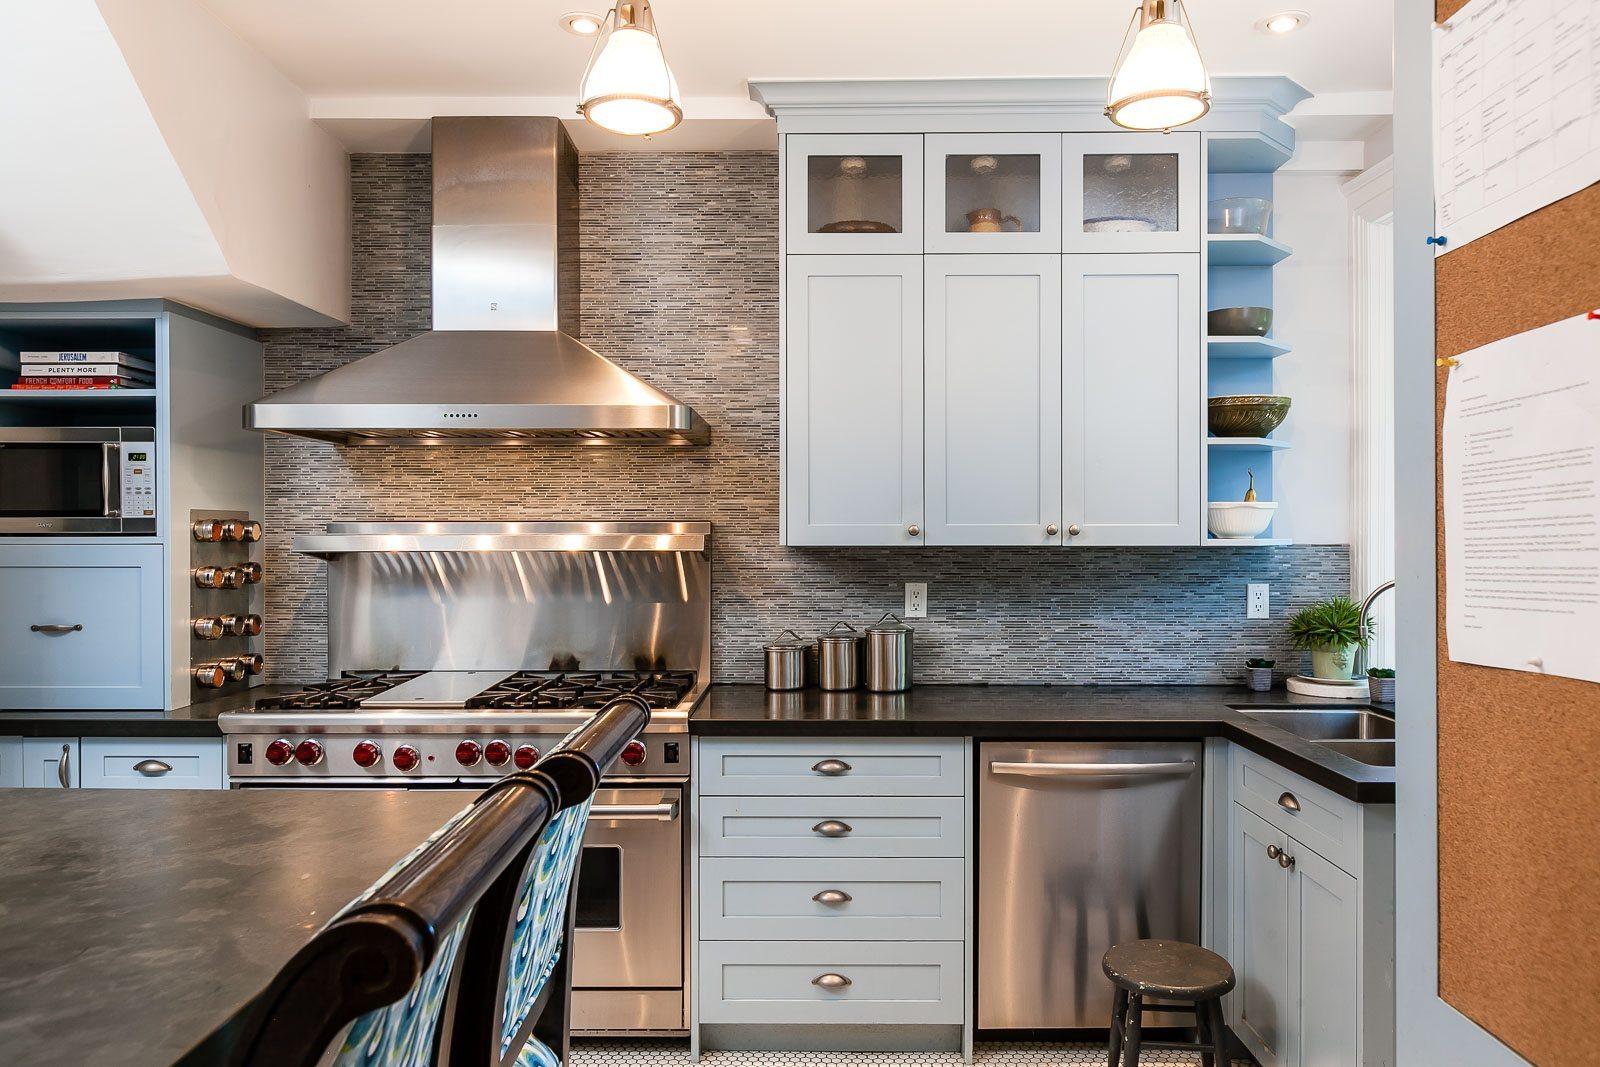 toronto-house-sold-223-wright-avenue-6